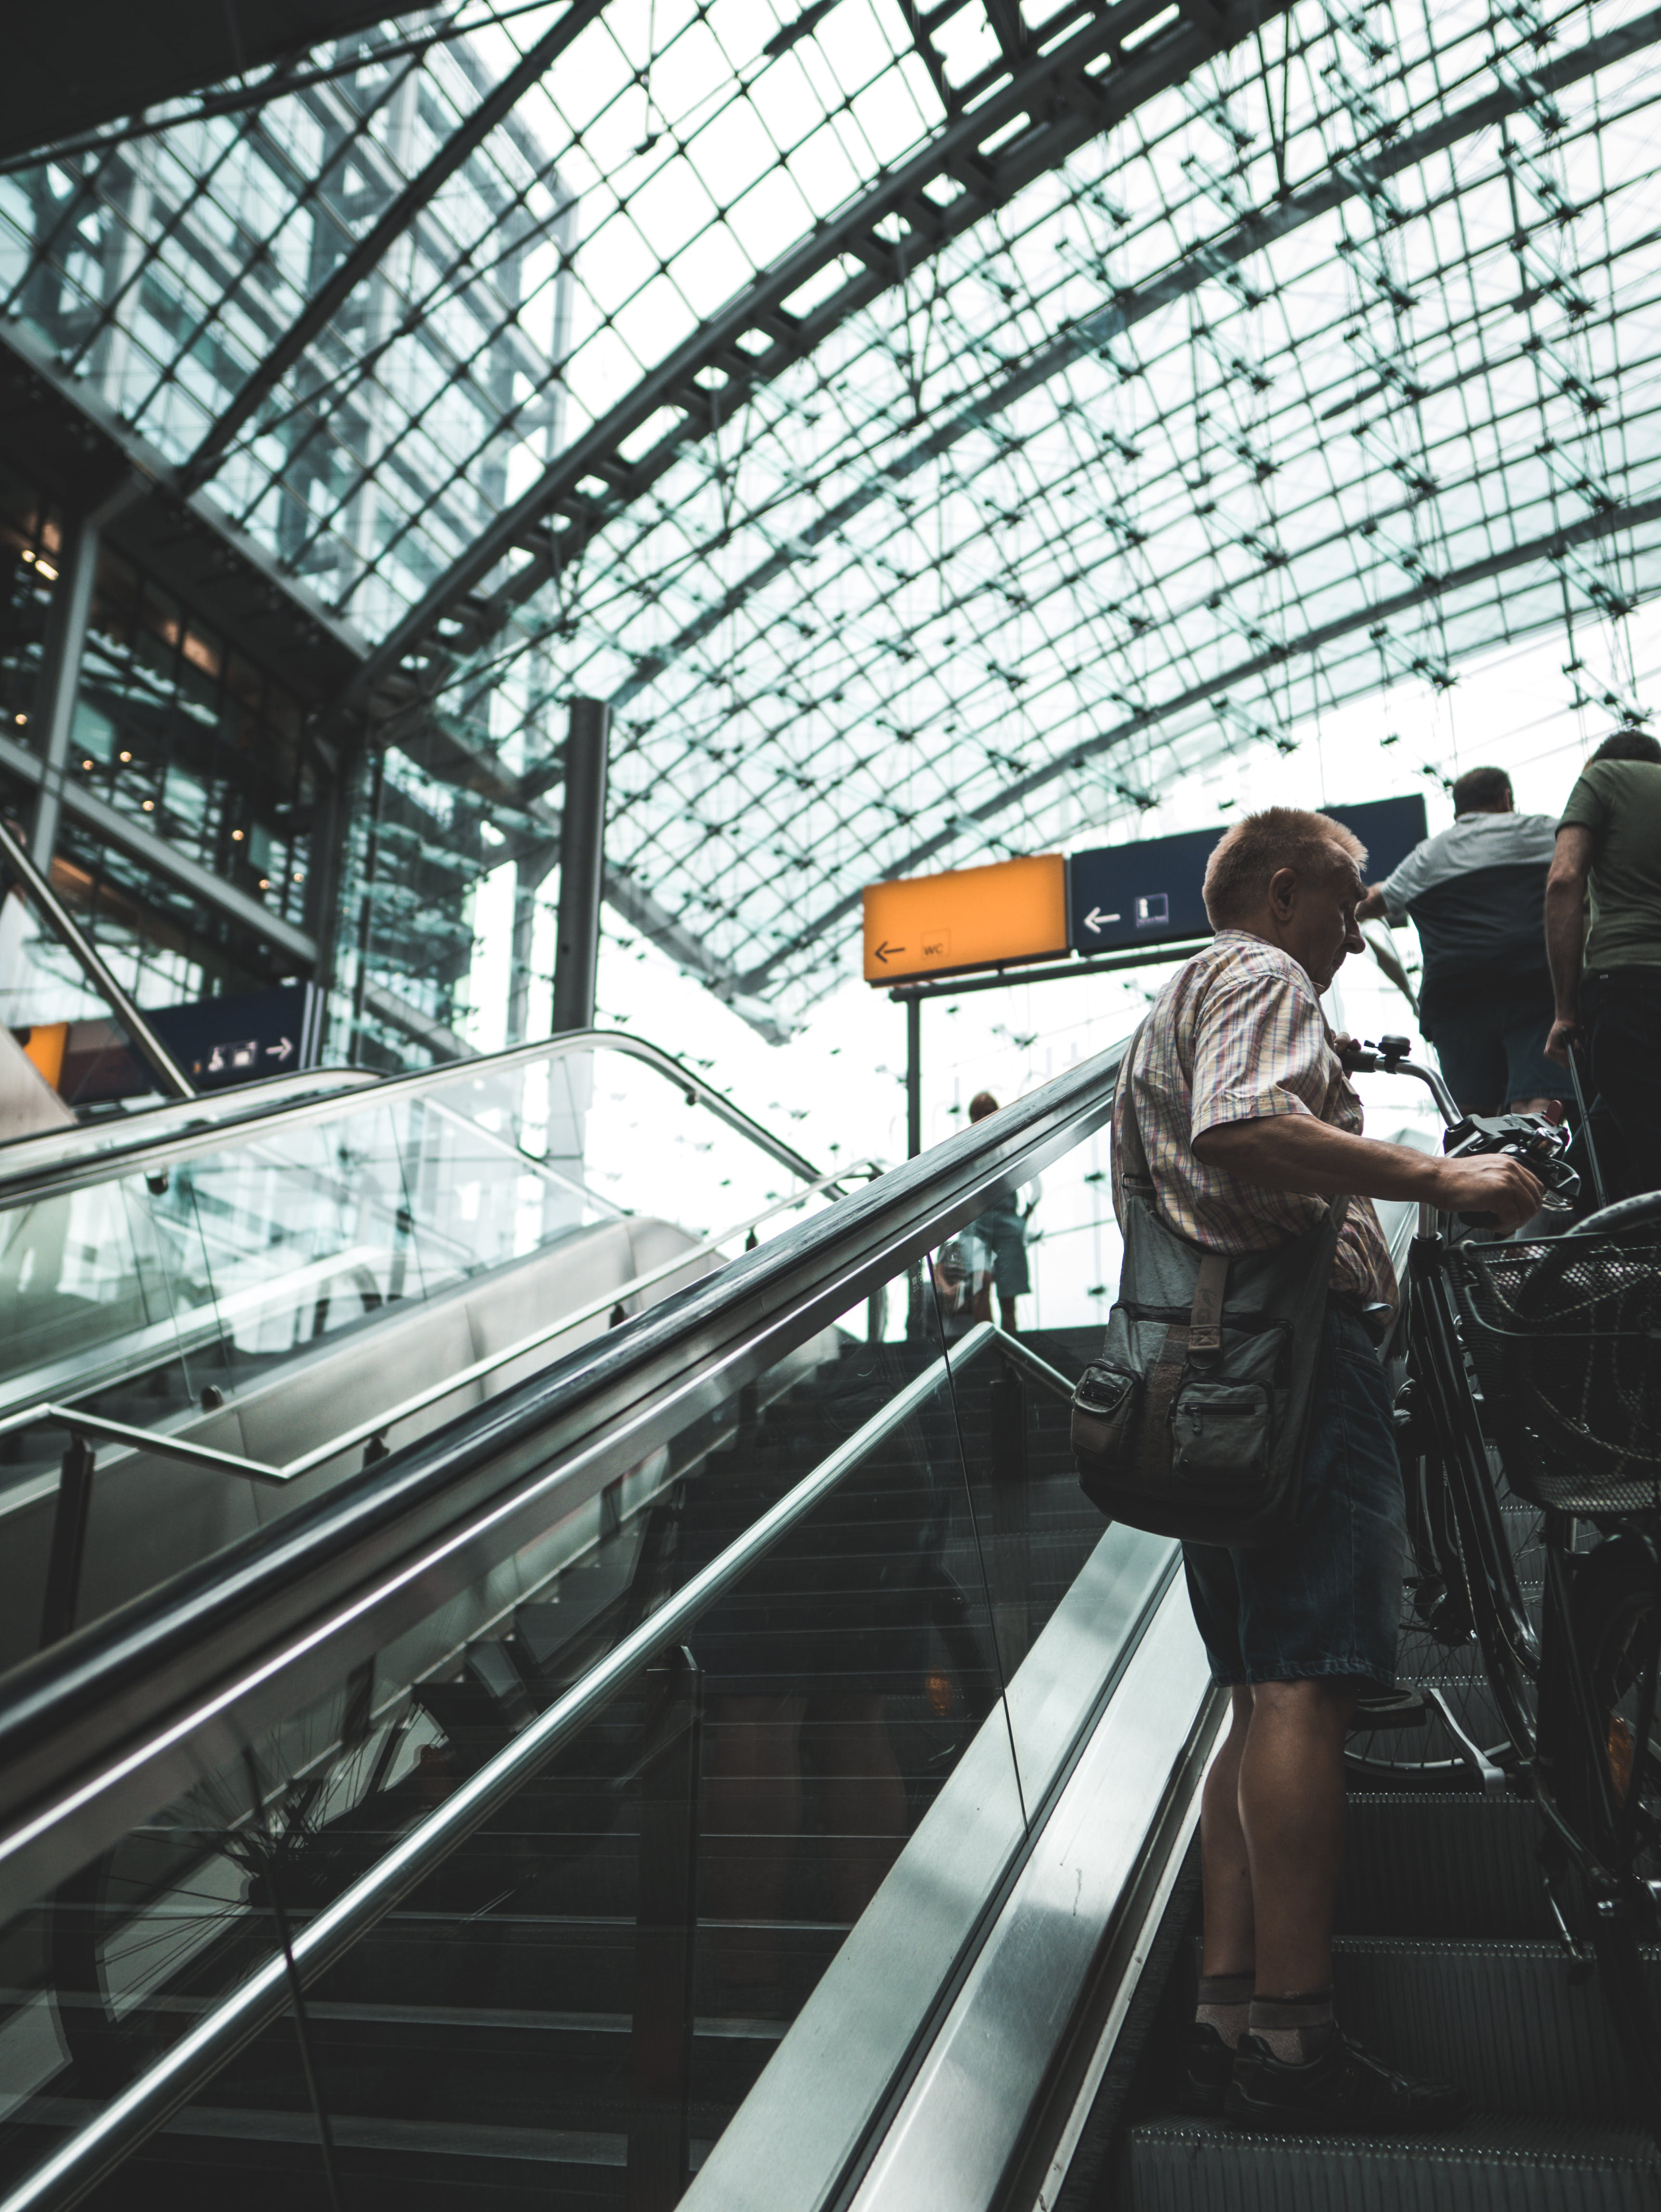 Man Standing On Escalator Holding Bike